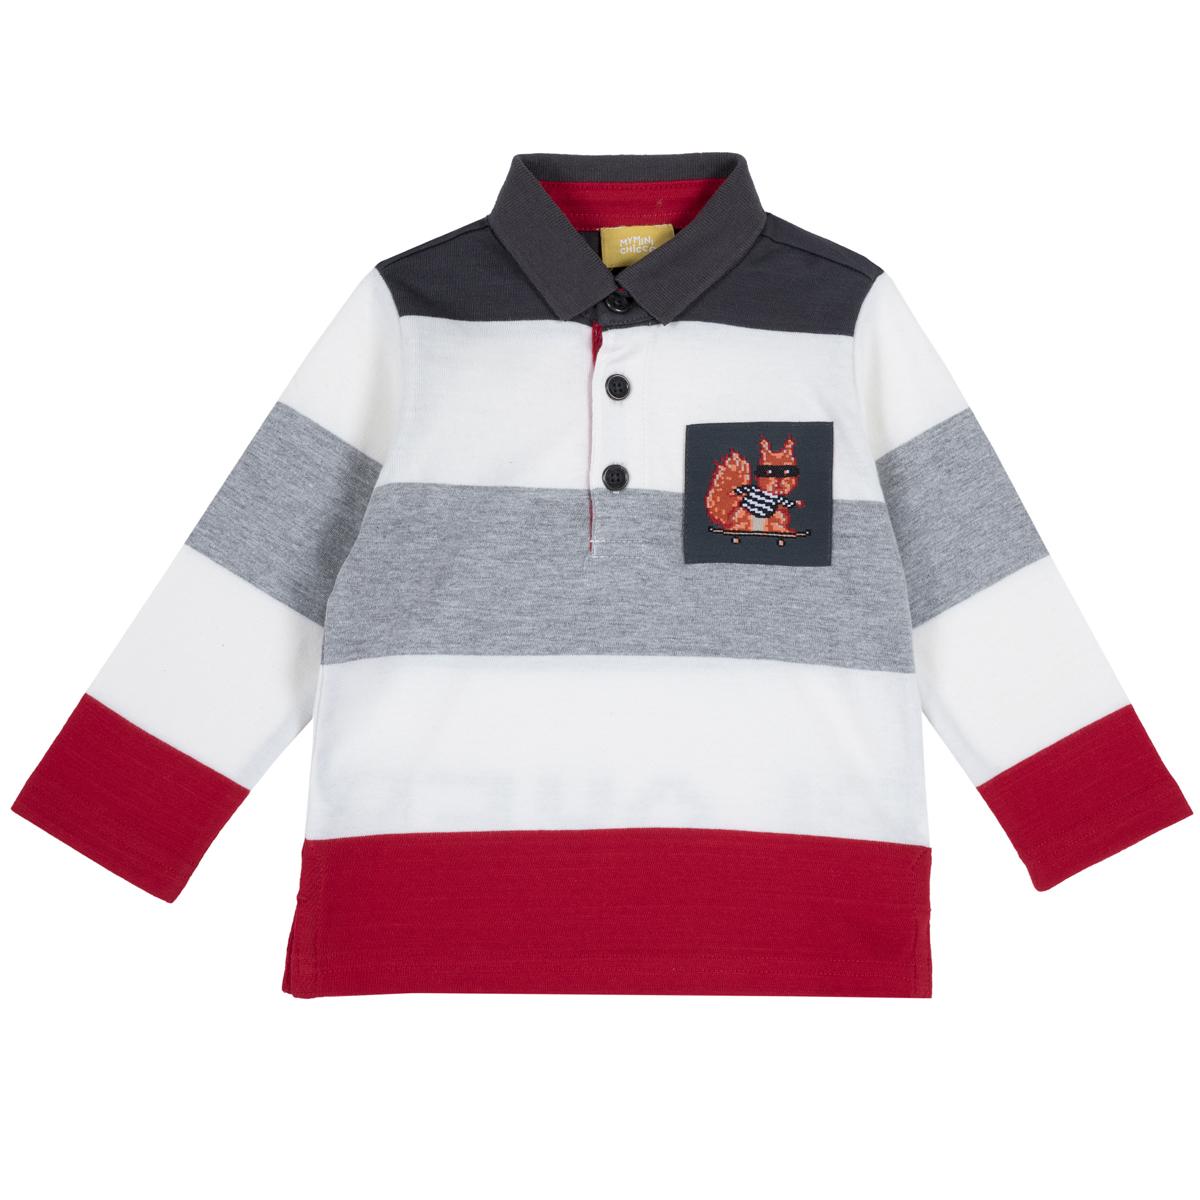 Tricou Polo Copii Chicco, Maneca Lunga, Alb Cu Dungi Colorate, 33512